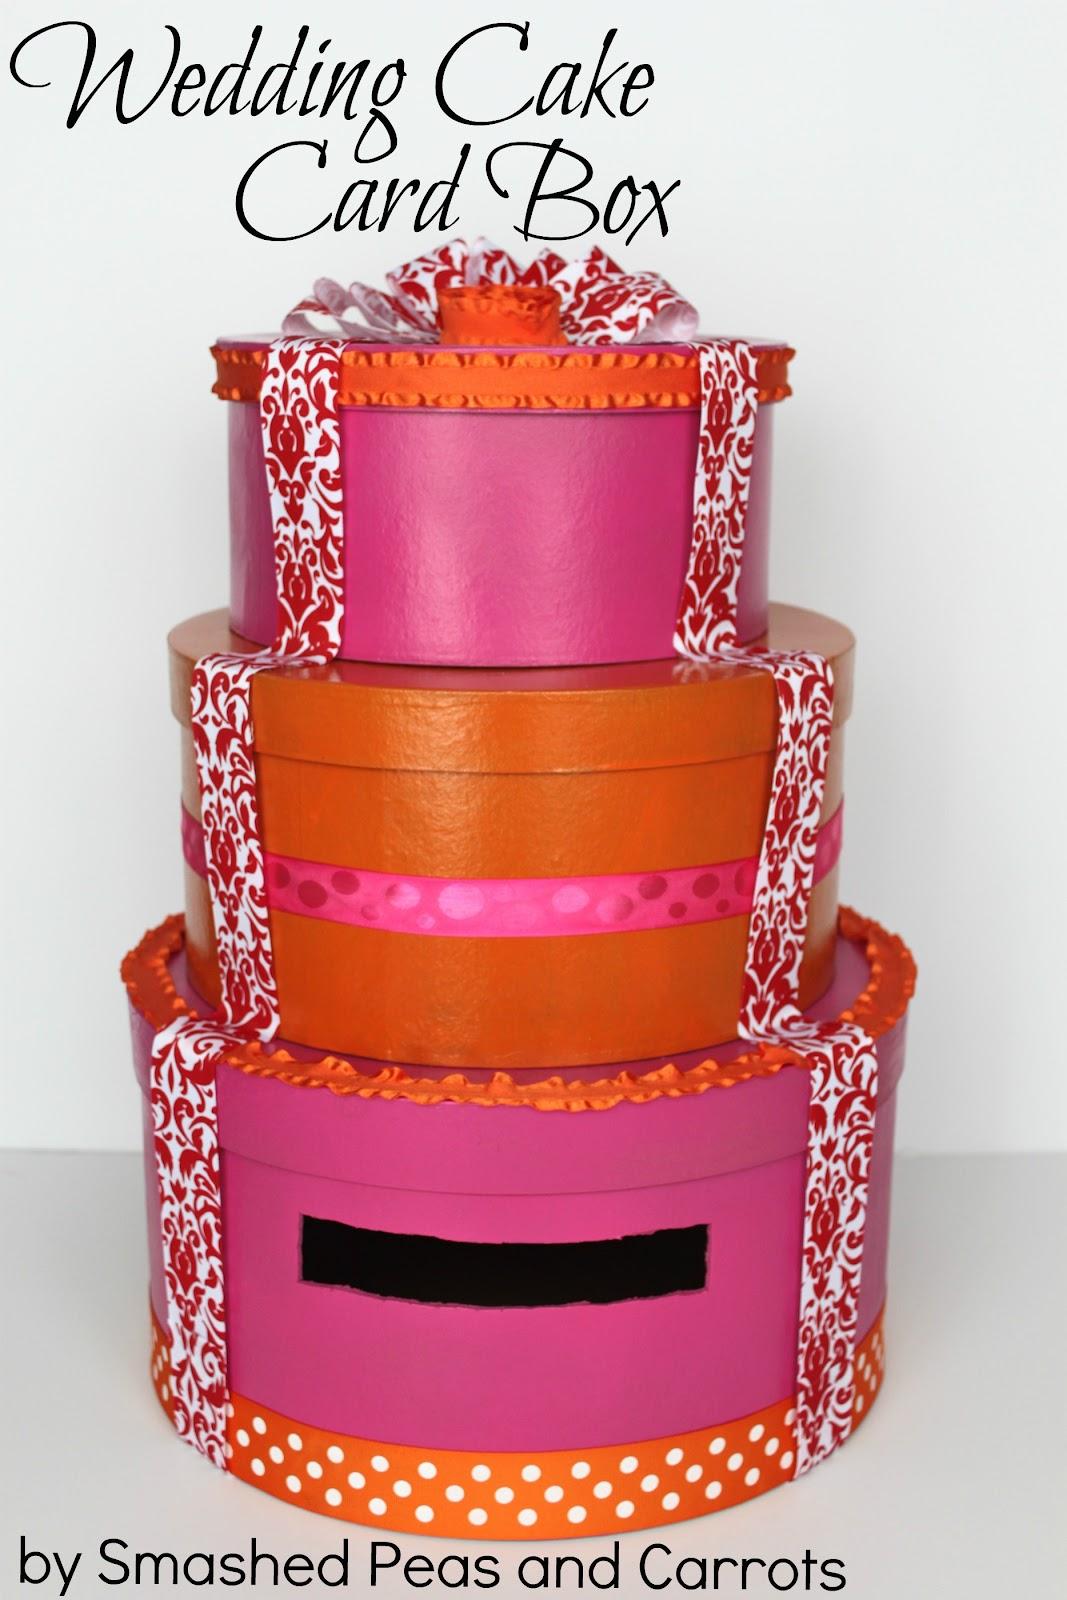 Wedding Cake Card Box Tutorial Smashed Peas Carrots